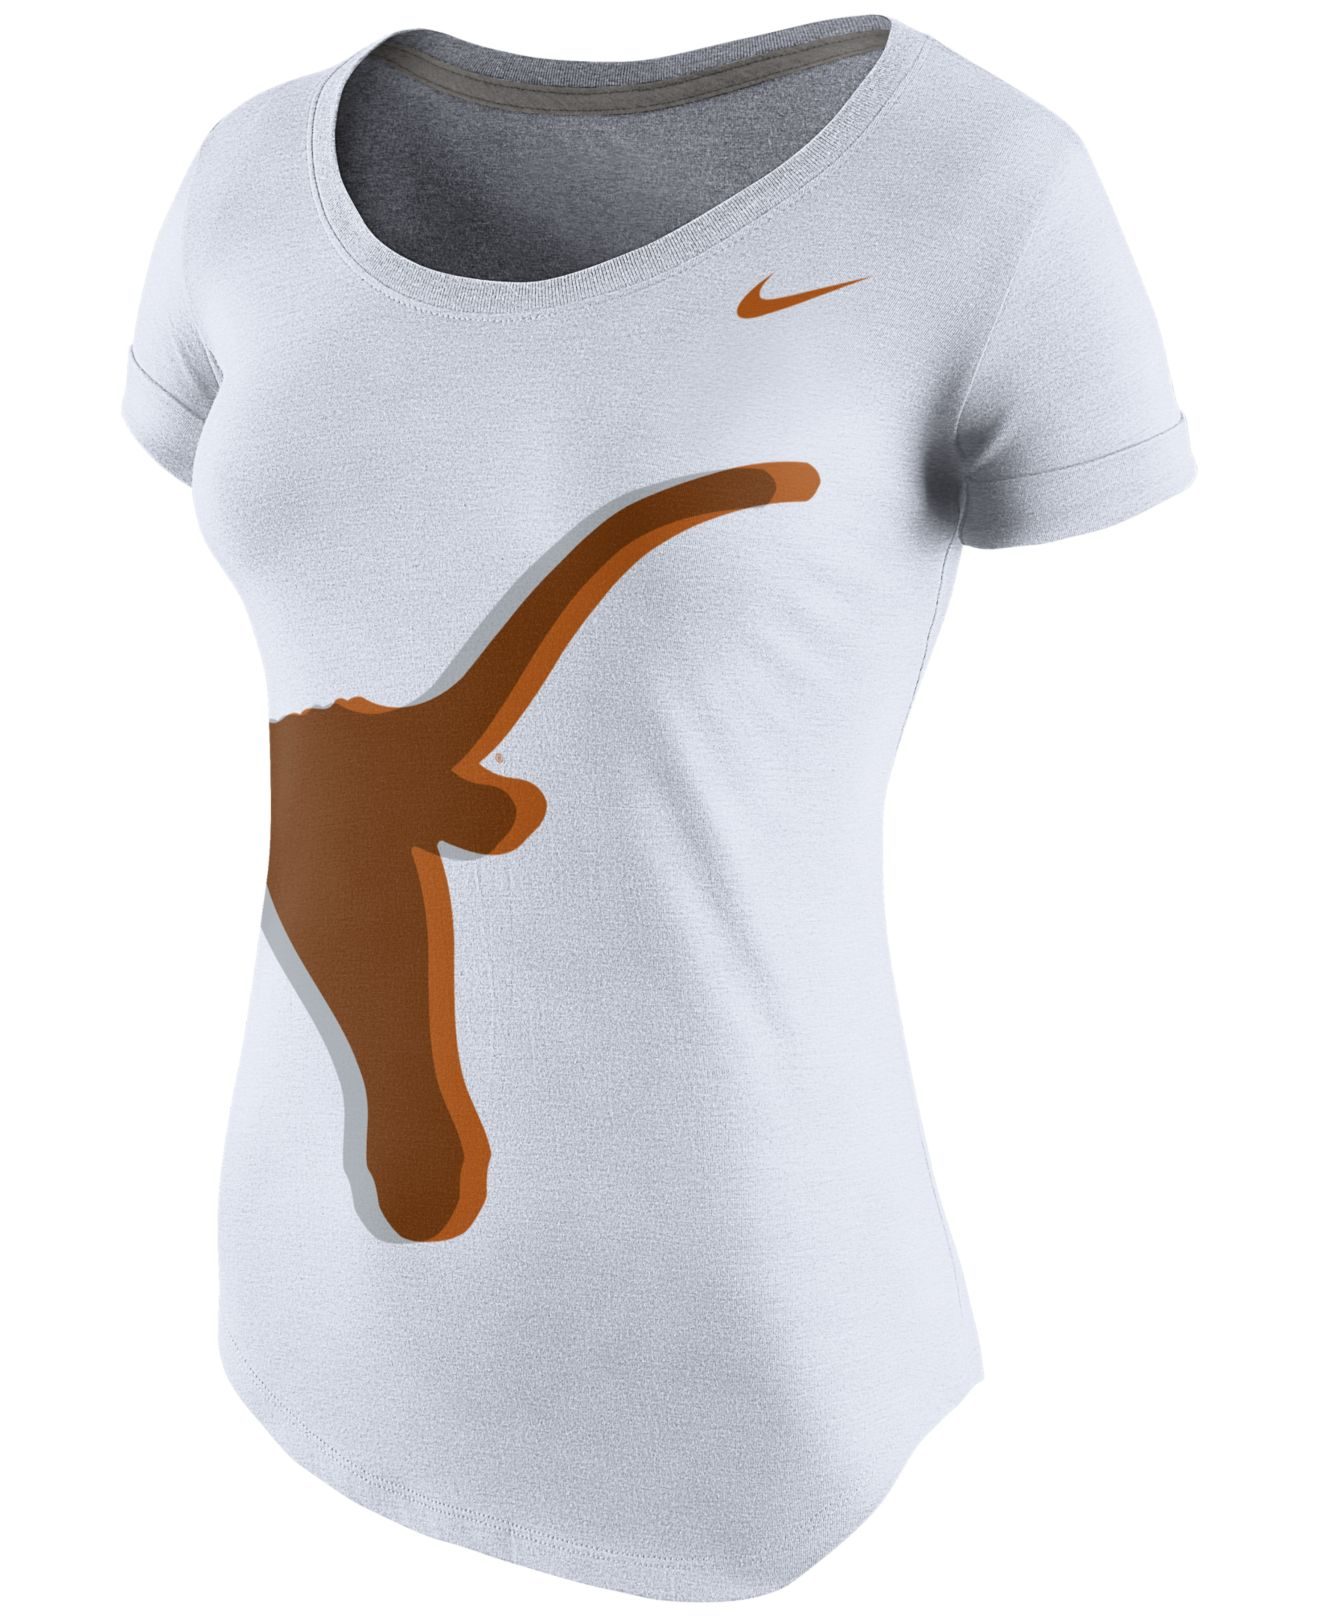 los angeles 2d19a f4ac4 Nike Women S Texas Longhorns Scoop Tri-Blend T-Shirt in White - Lyst